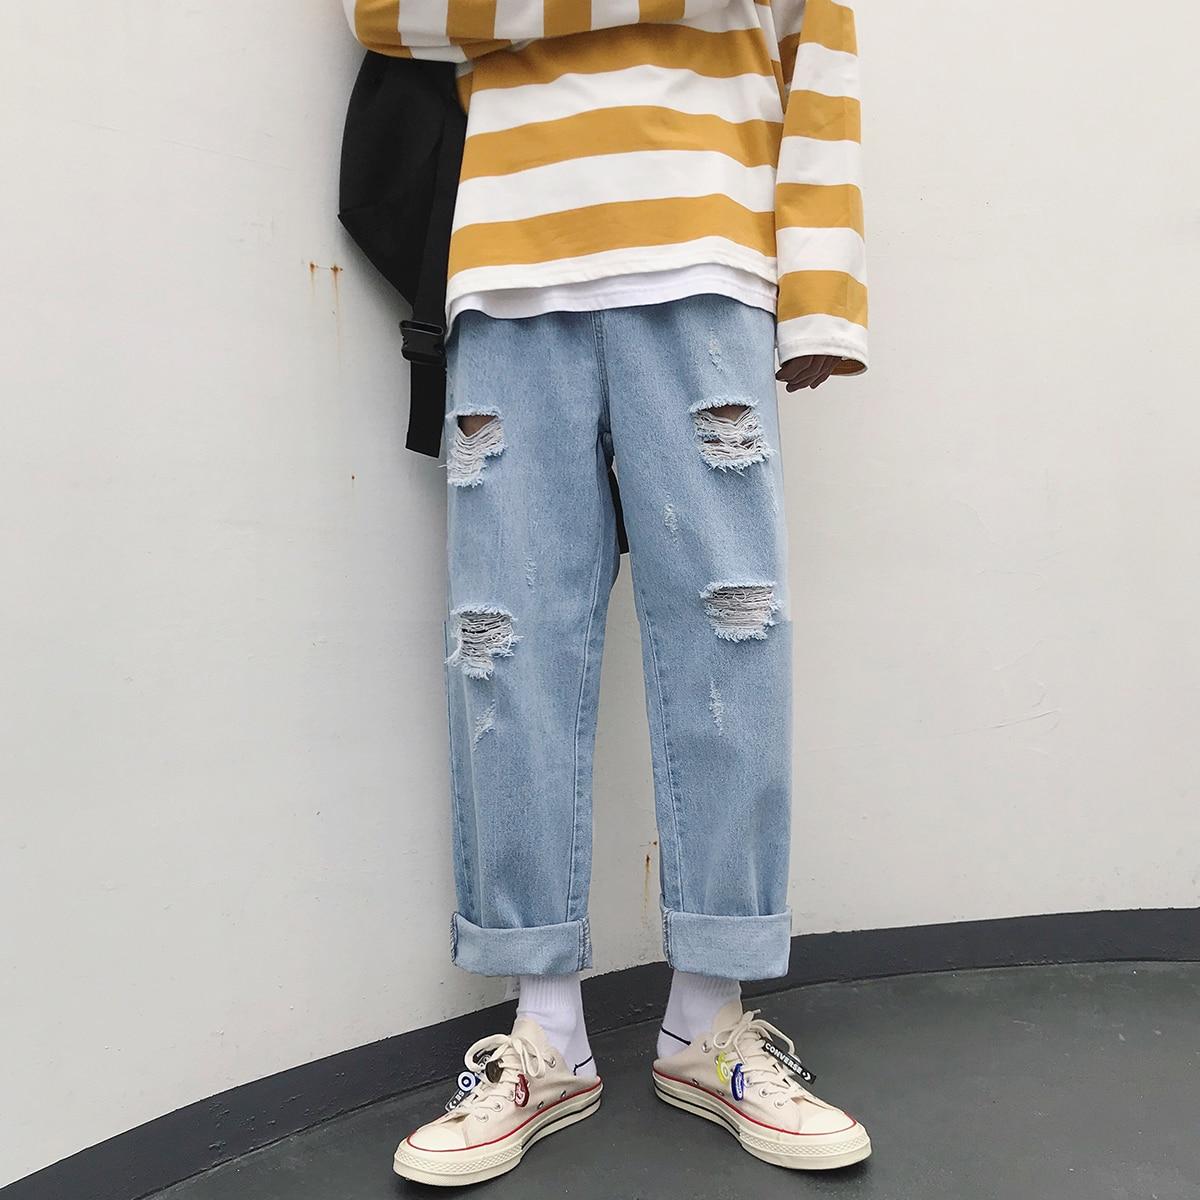 2019 Summer Men's Holes Cowboy Beggar Casual Pants Baggy Homme Cargo Pocket Wash Jeans Blue Biker Denim Mens Trousers S-2XL